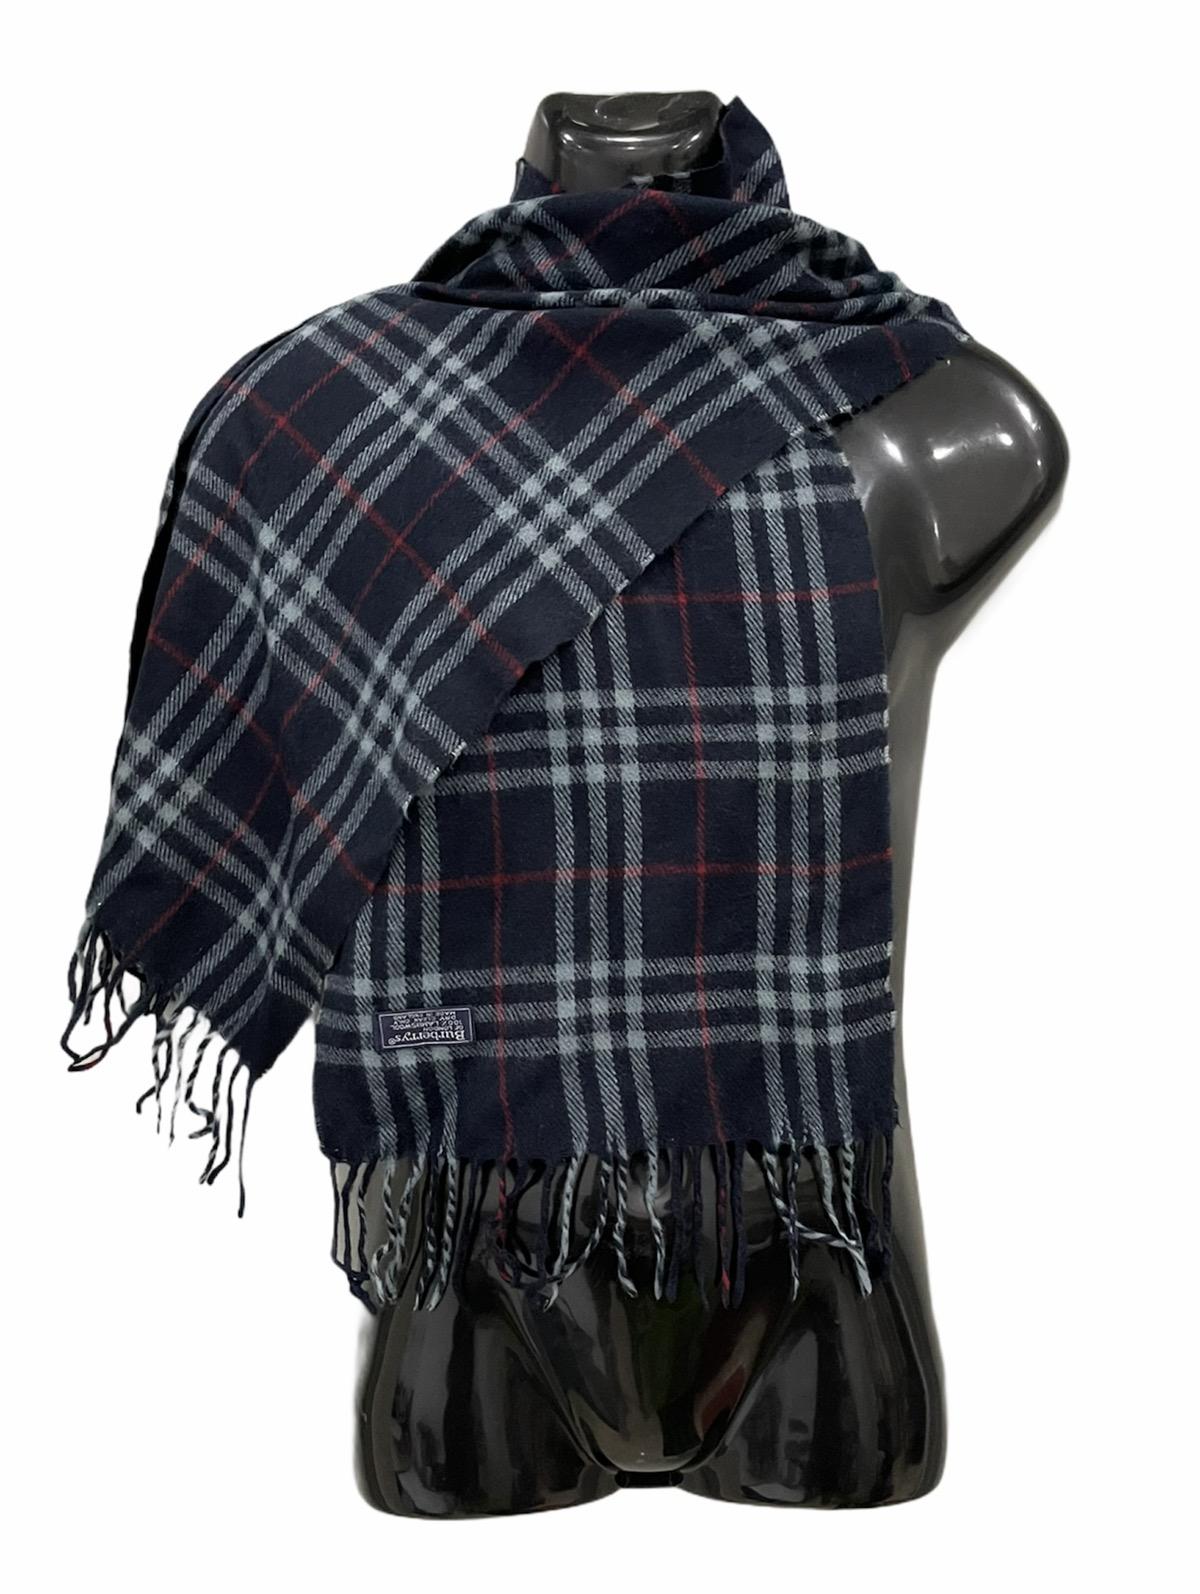 Authentic Burberry Scarf : authentic, burberry, scarf, Burberry, Authentic, Burberrys, Scarf, Muffler, Grailed